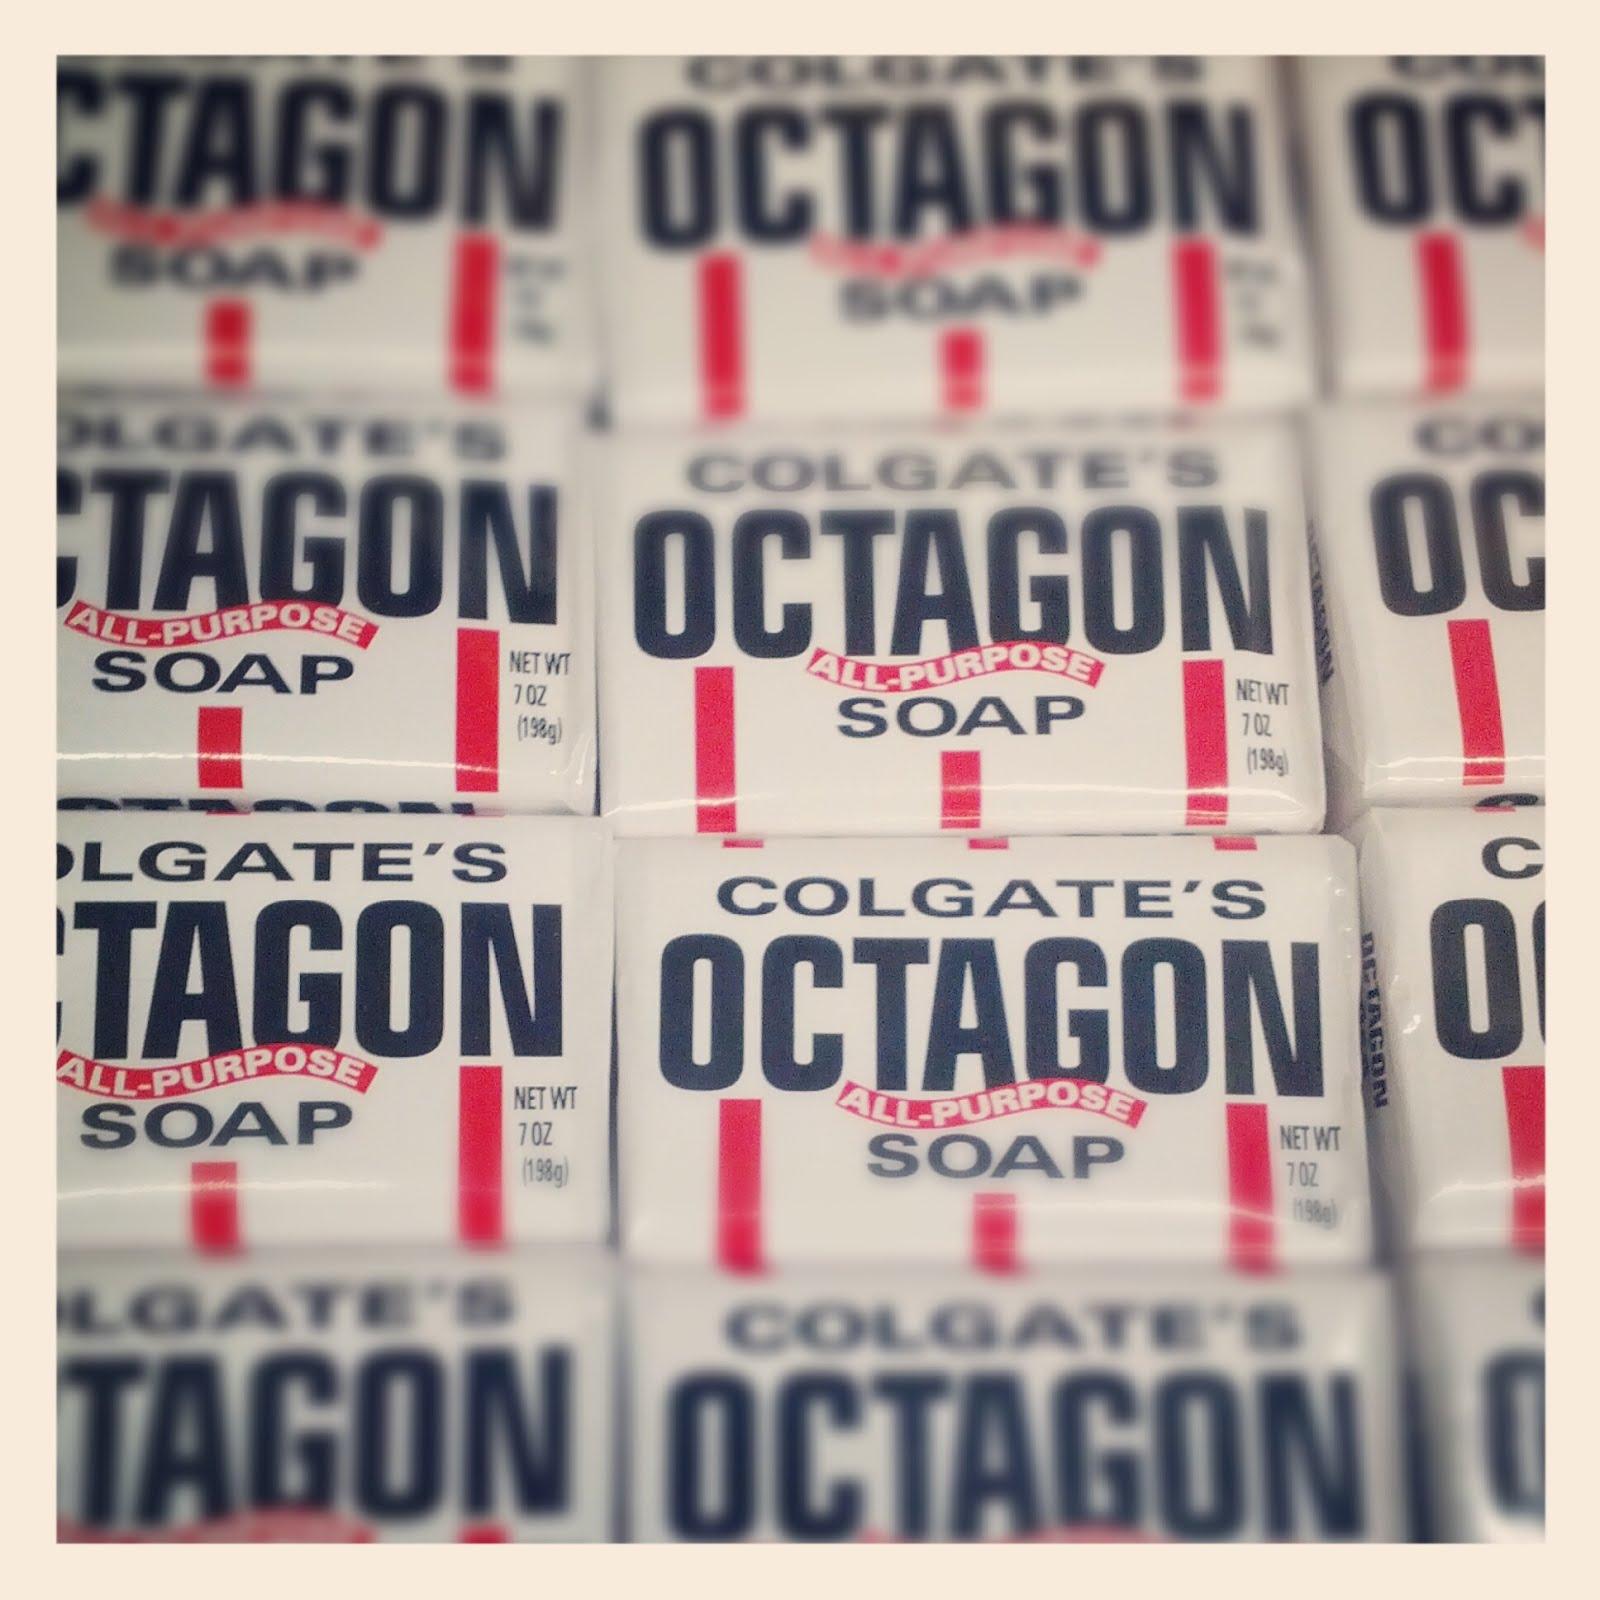 Octagon soap acne